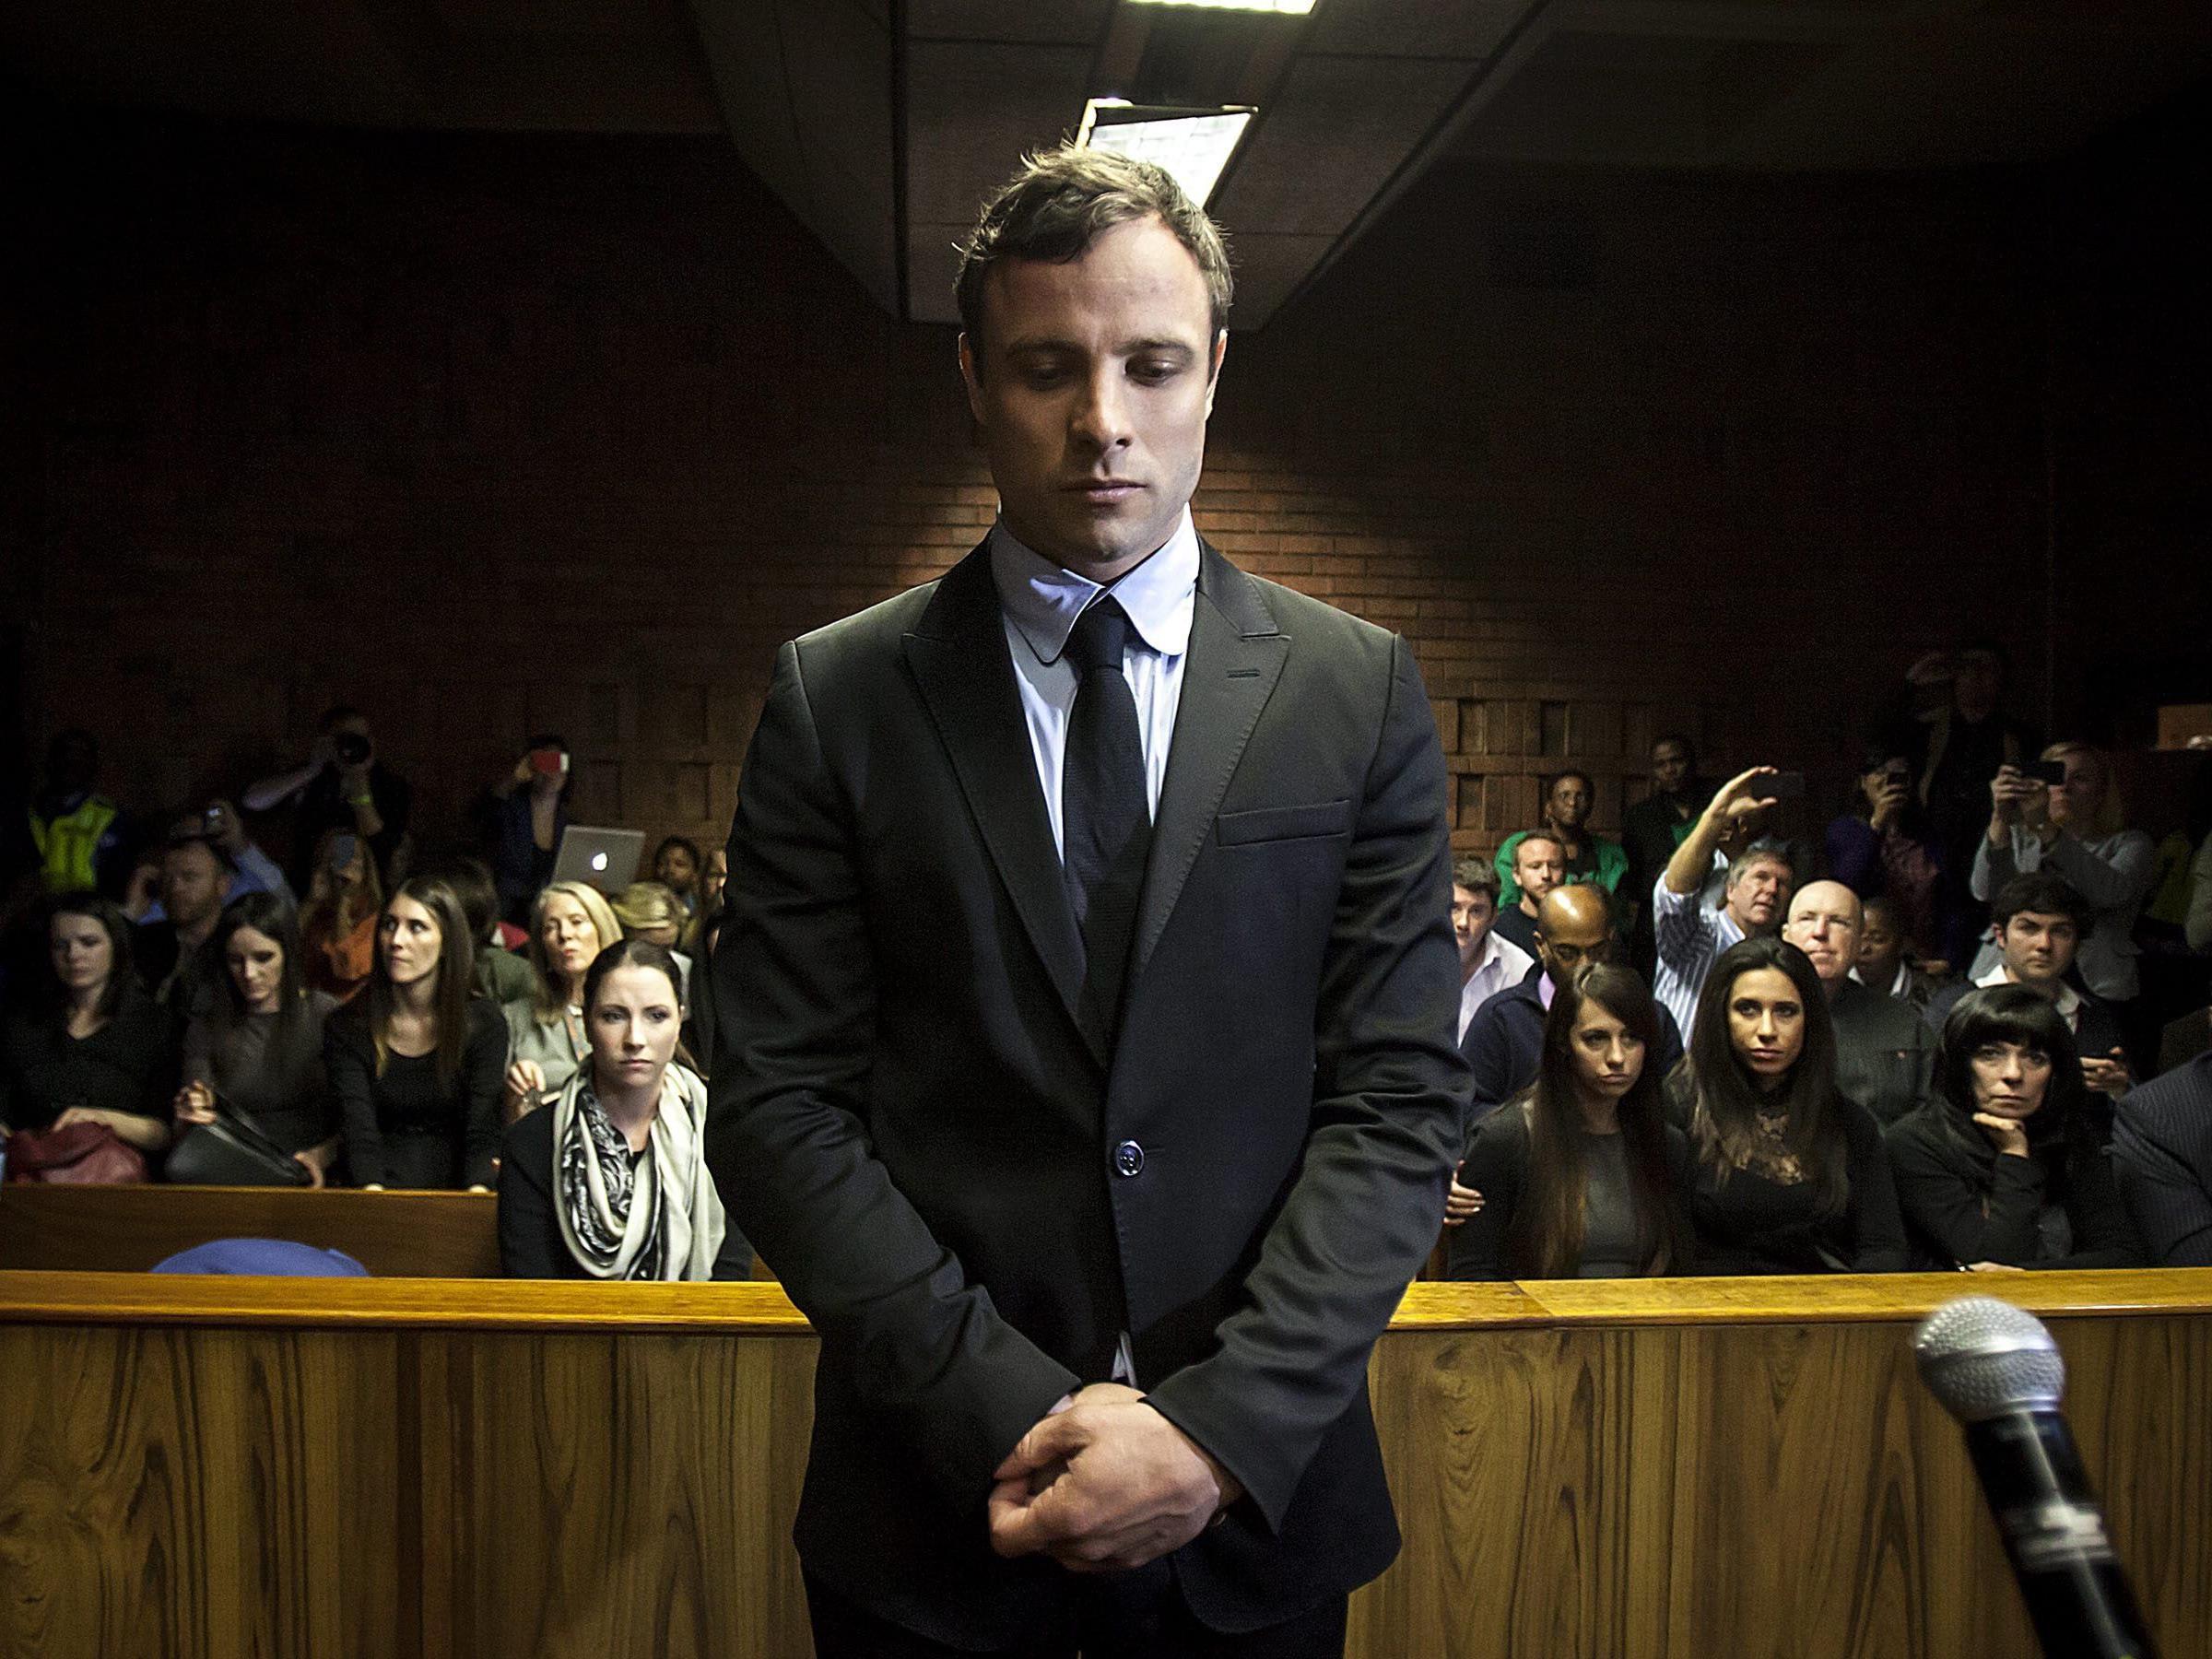 Staatsanwaltschaft will Pistorius-Urteil anfechten.